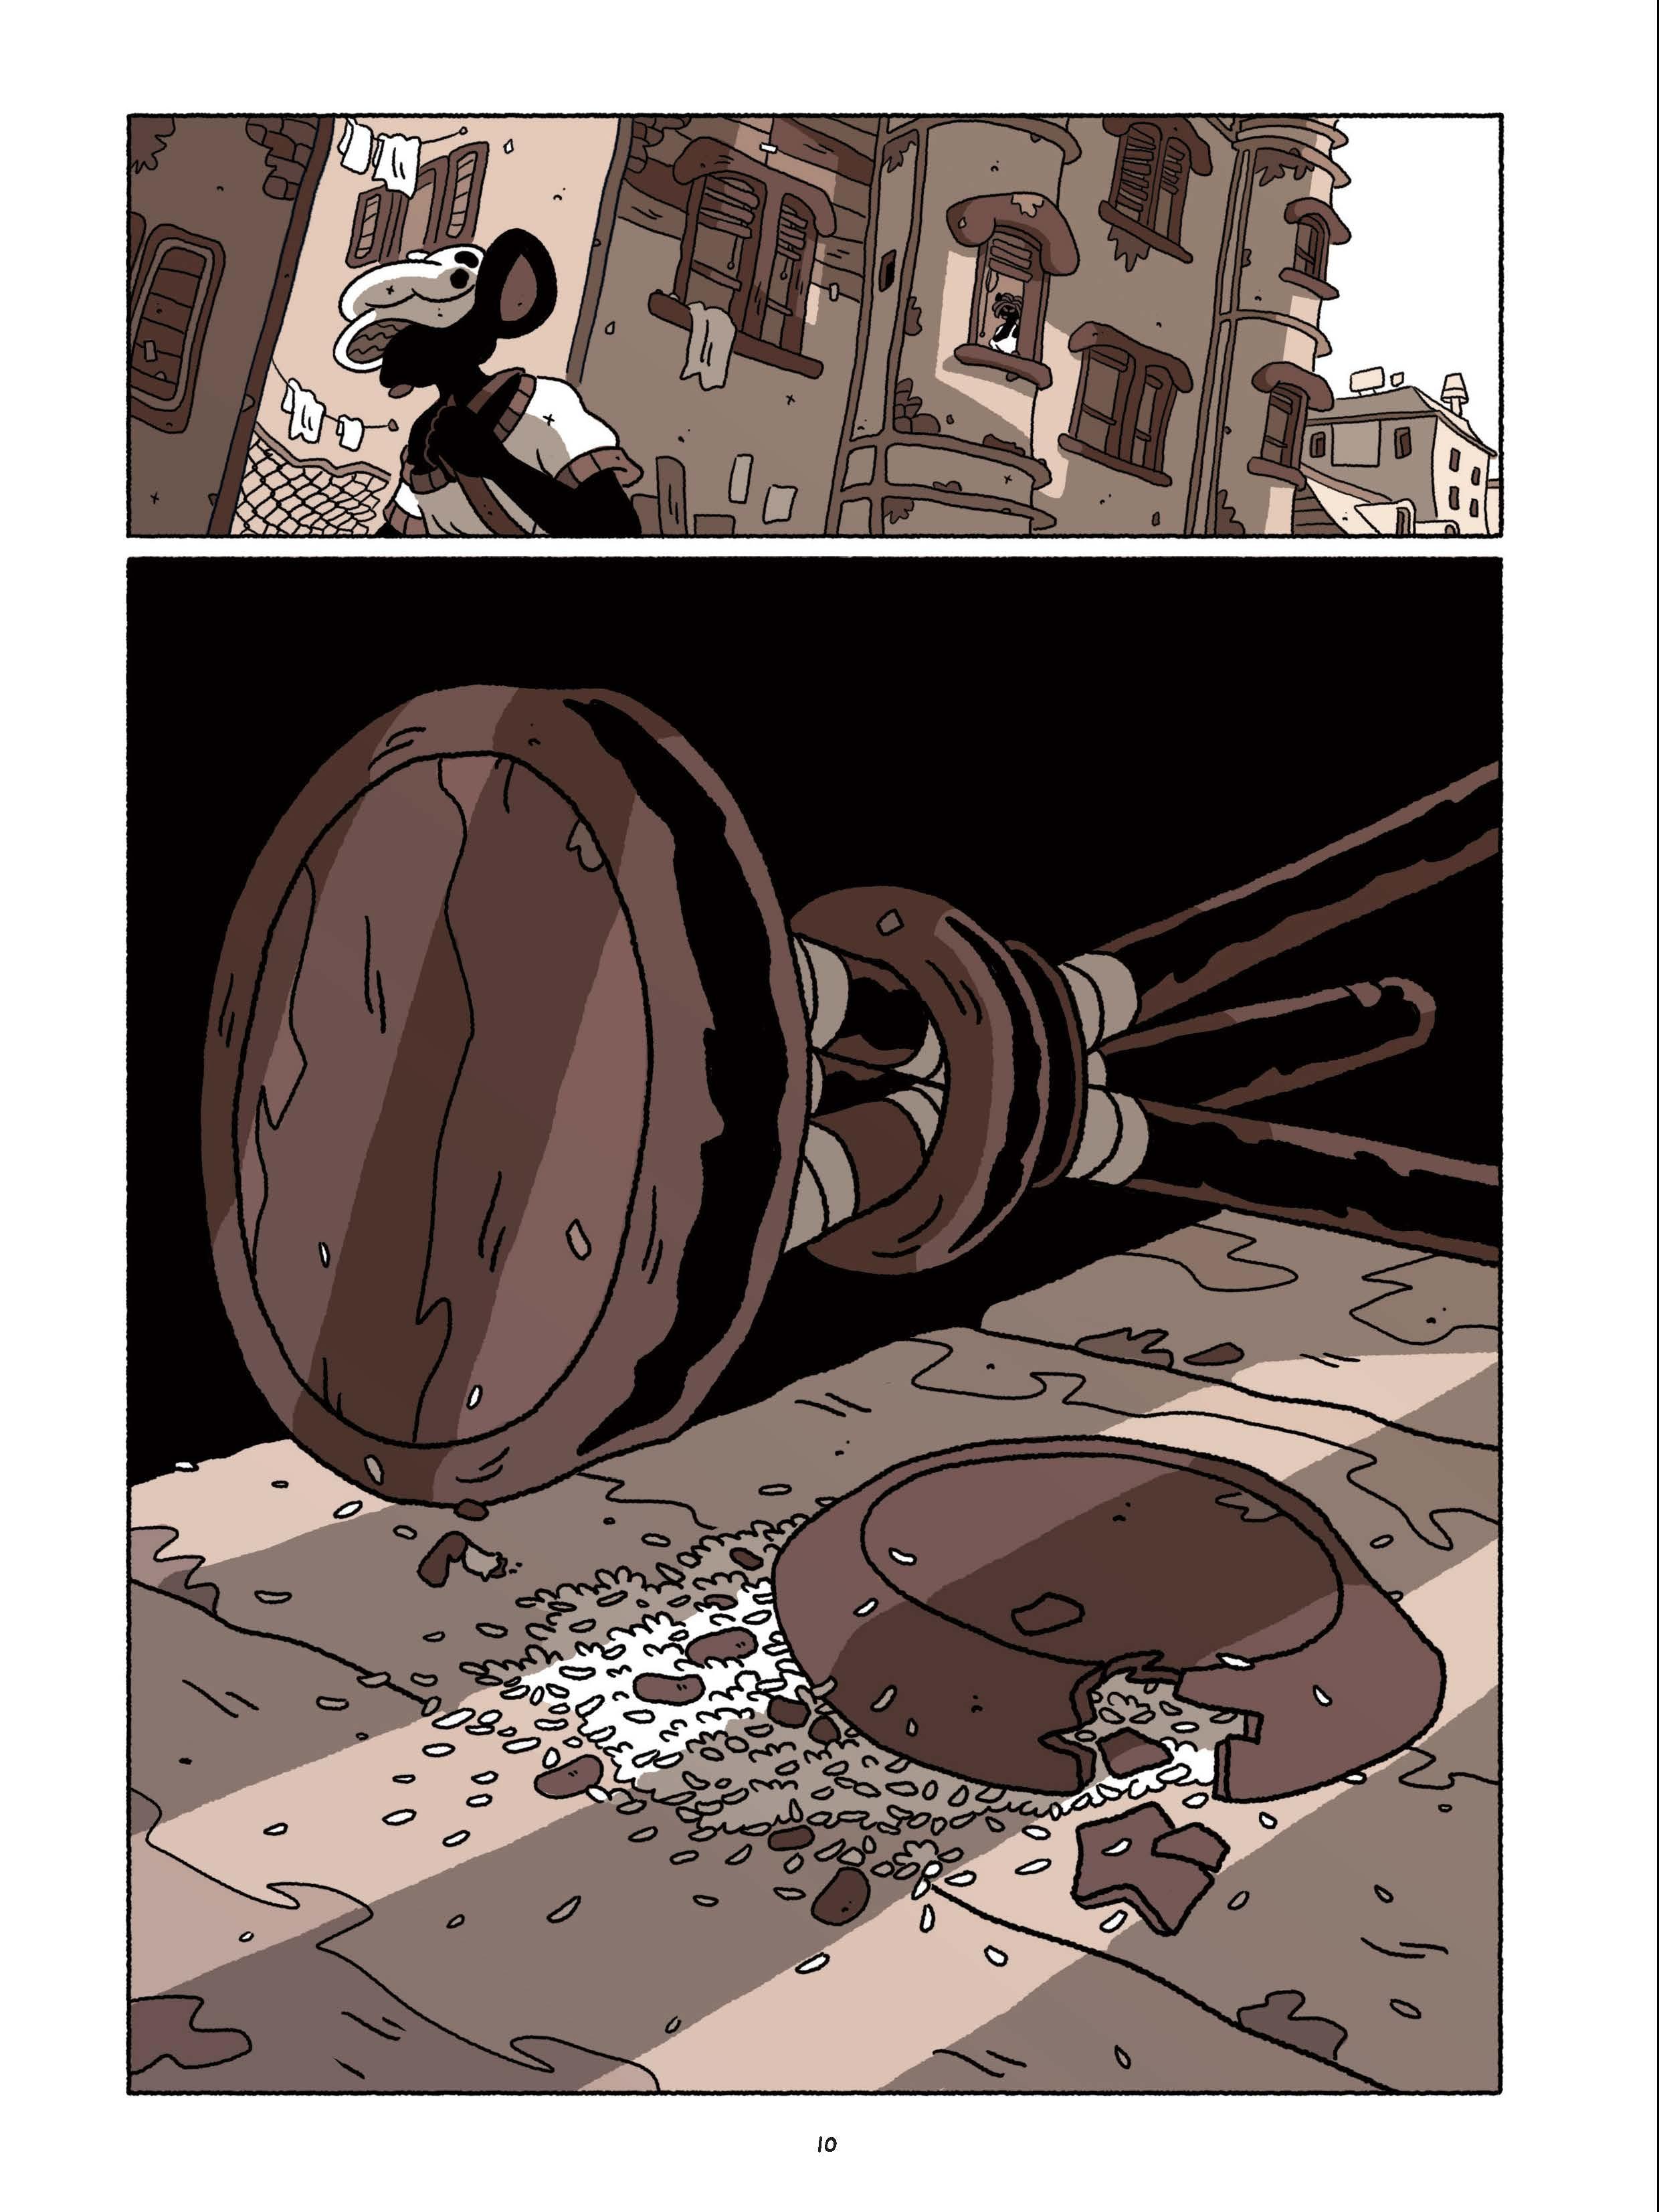 Extrait n°5 par Leo Heitz